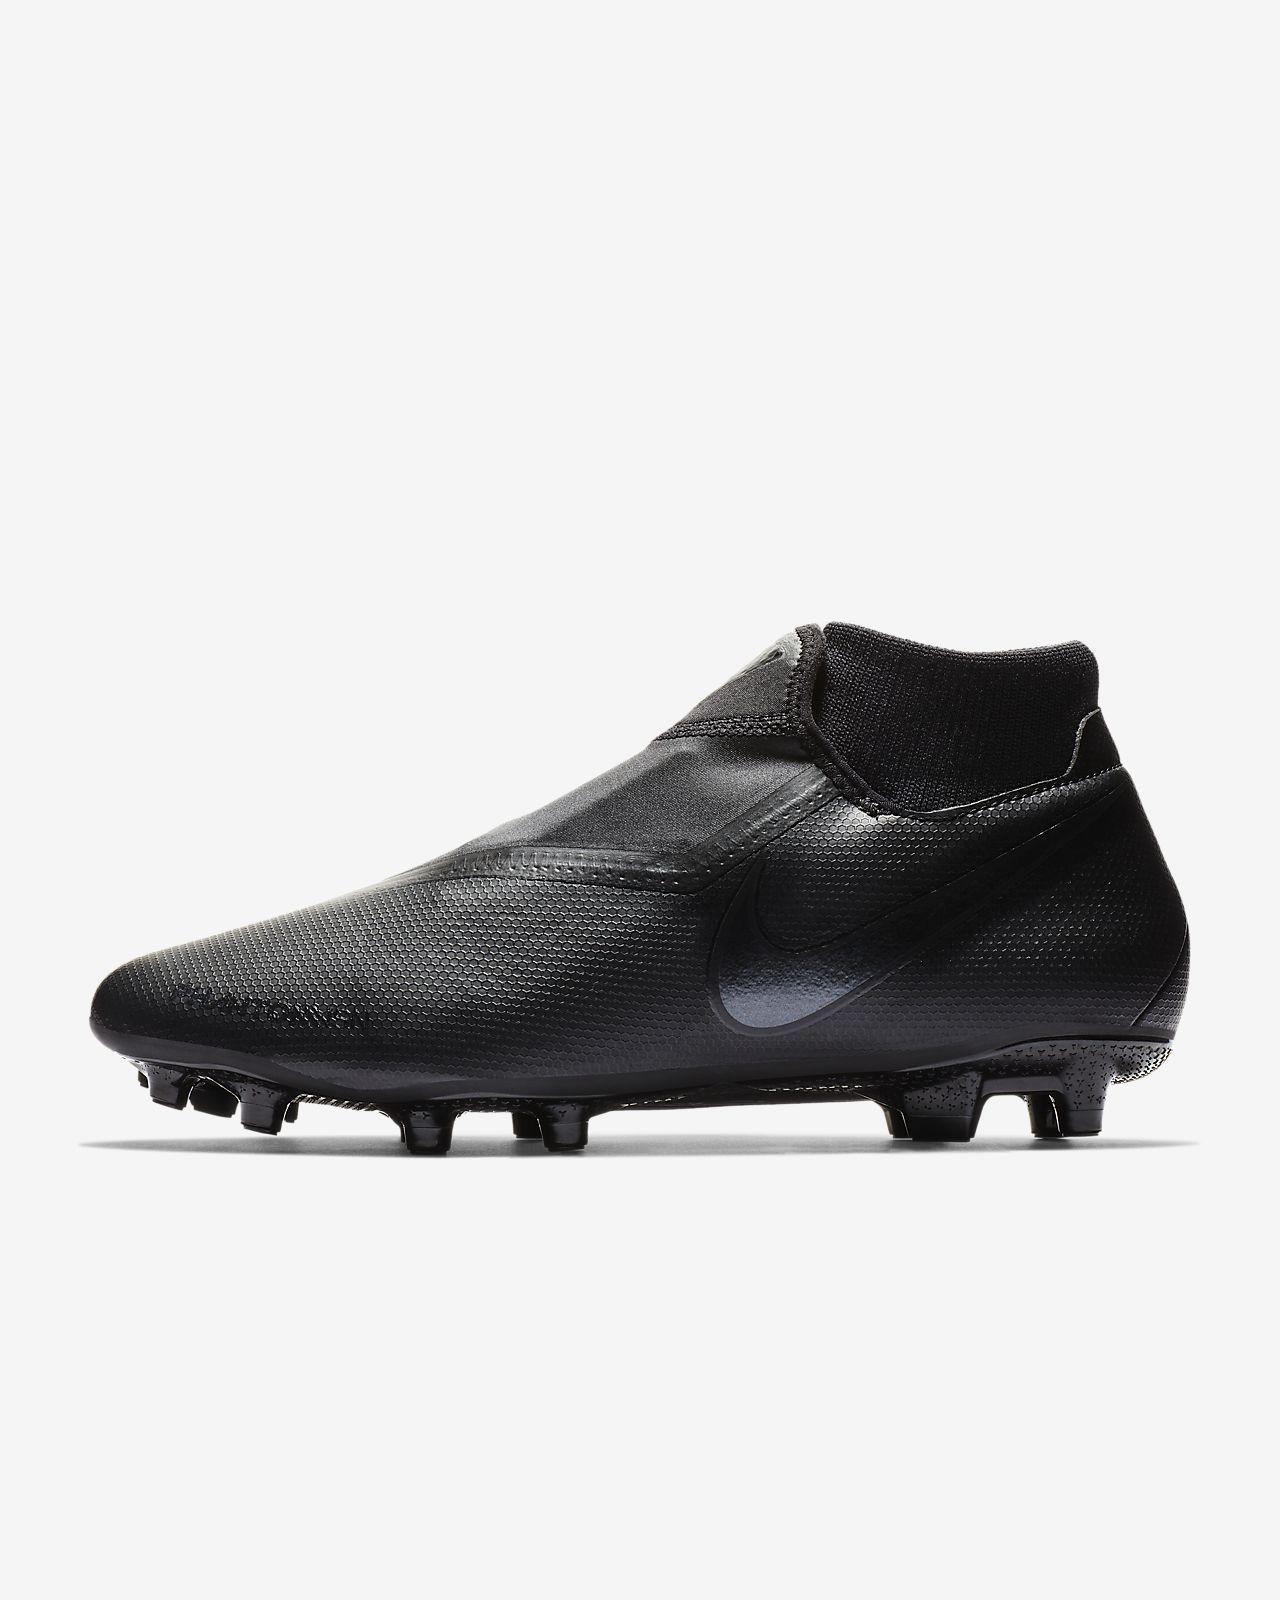 competitive price ee9be 47566 ... Nike Phantom Vision Academy Dynamic Fit MG Voetbalschoen (meerdere  ondergronden)